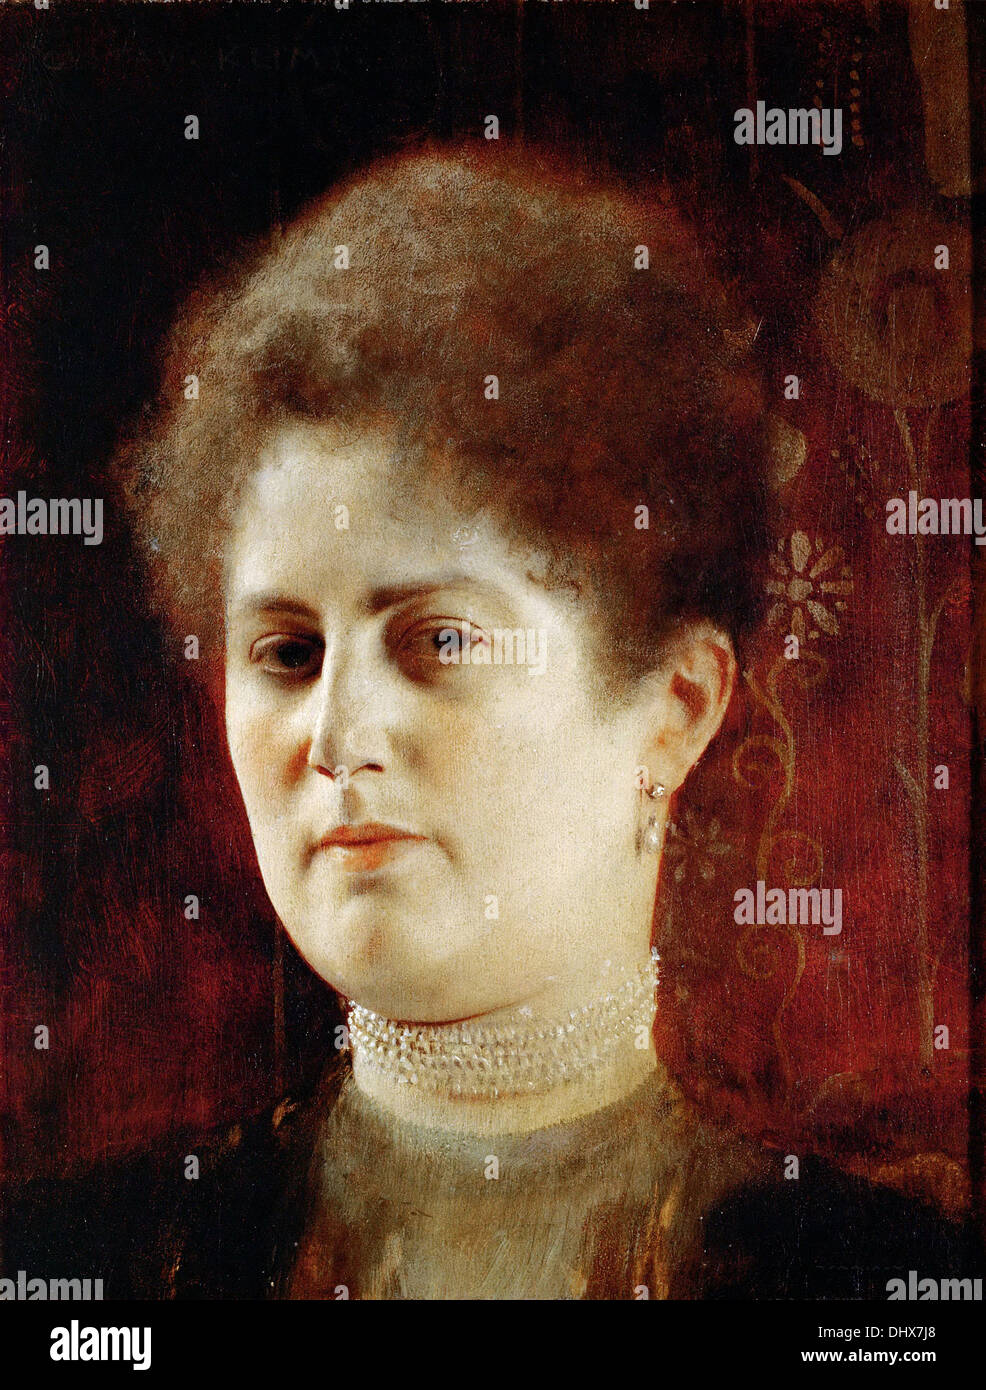 Portrait of a Lady - by Gustav Klimt, 1894 - Stock Image